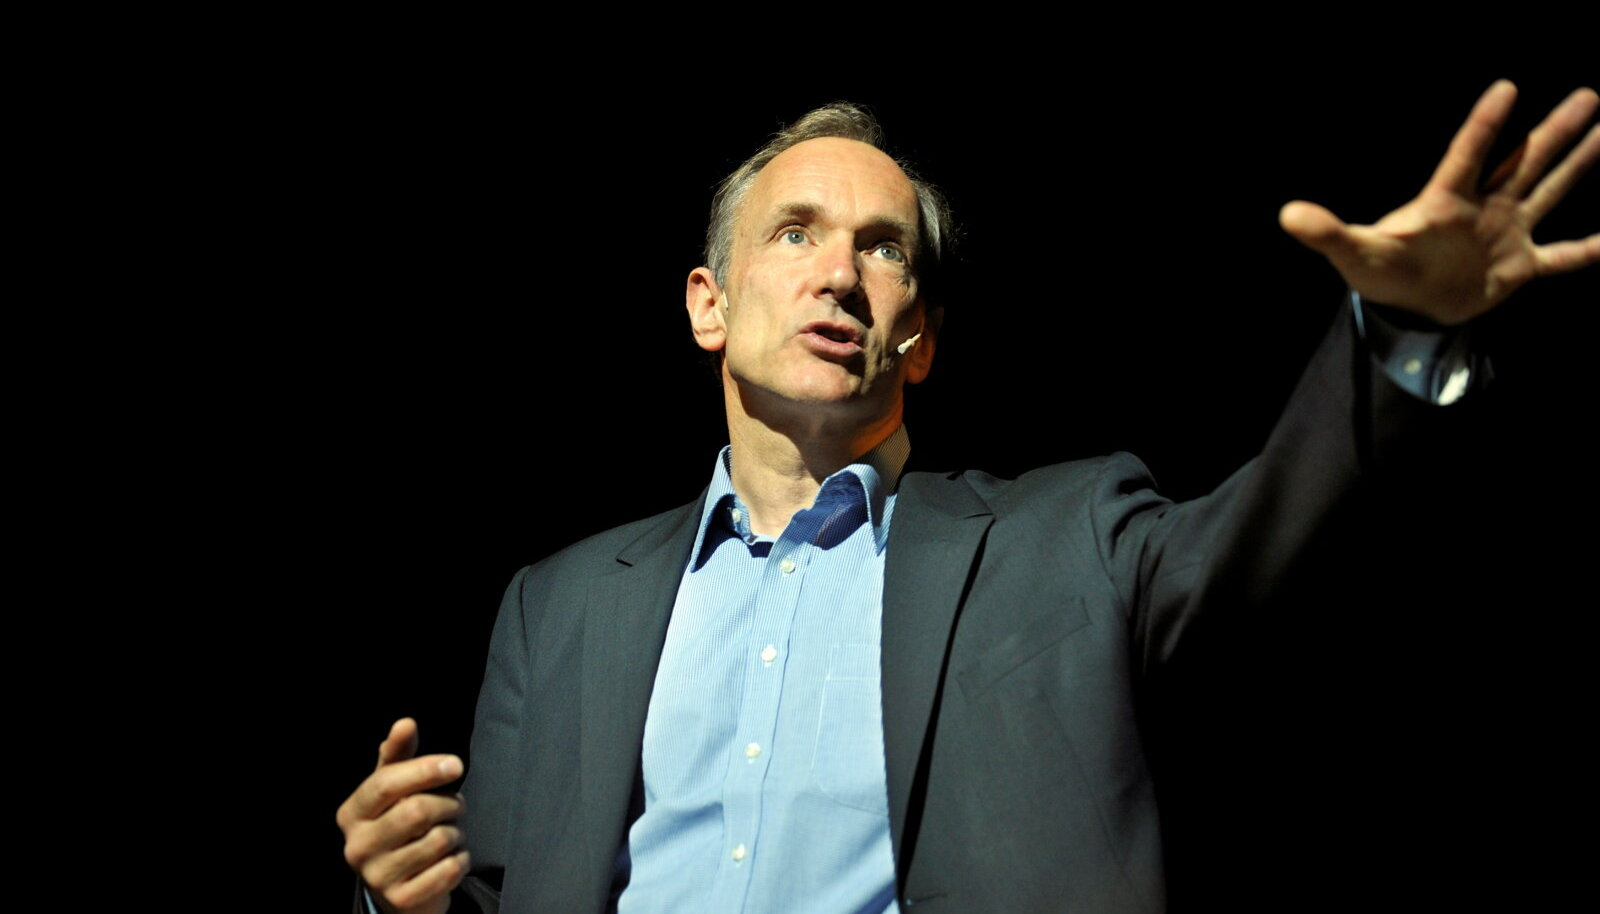 Berners-Lee 2011. a kõnet pidamas (foto: REUTERS / Scanpix)